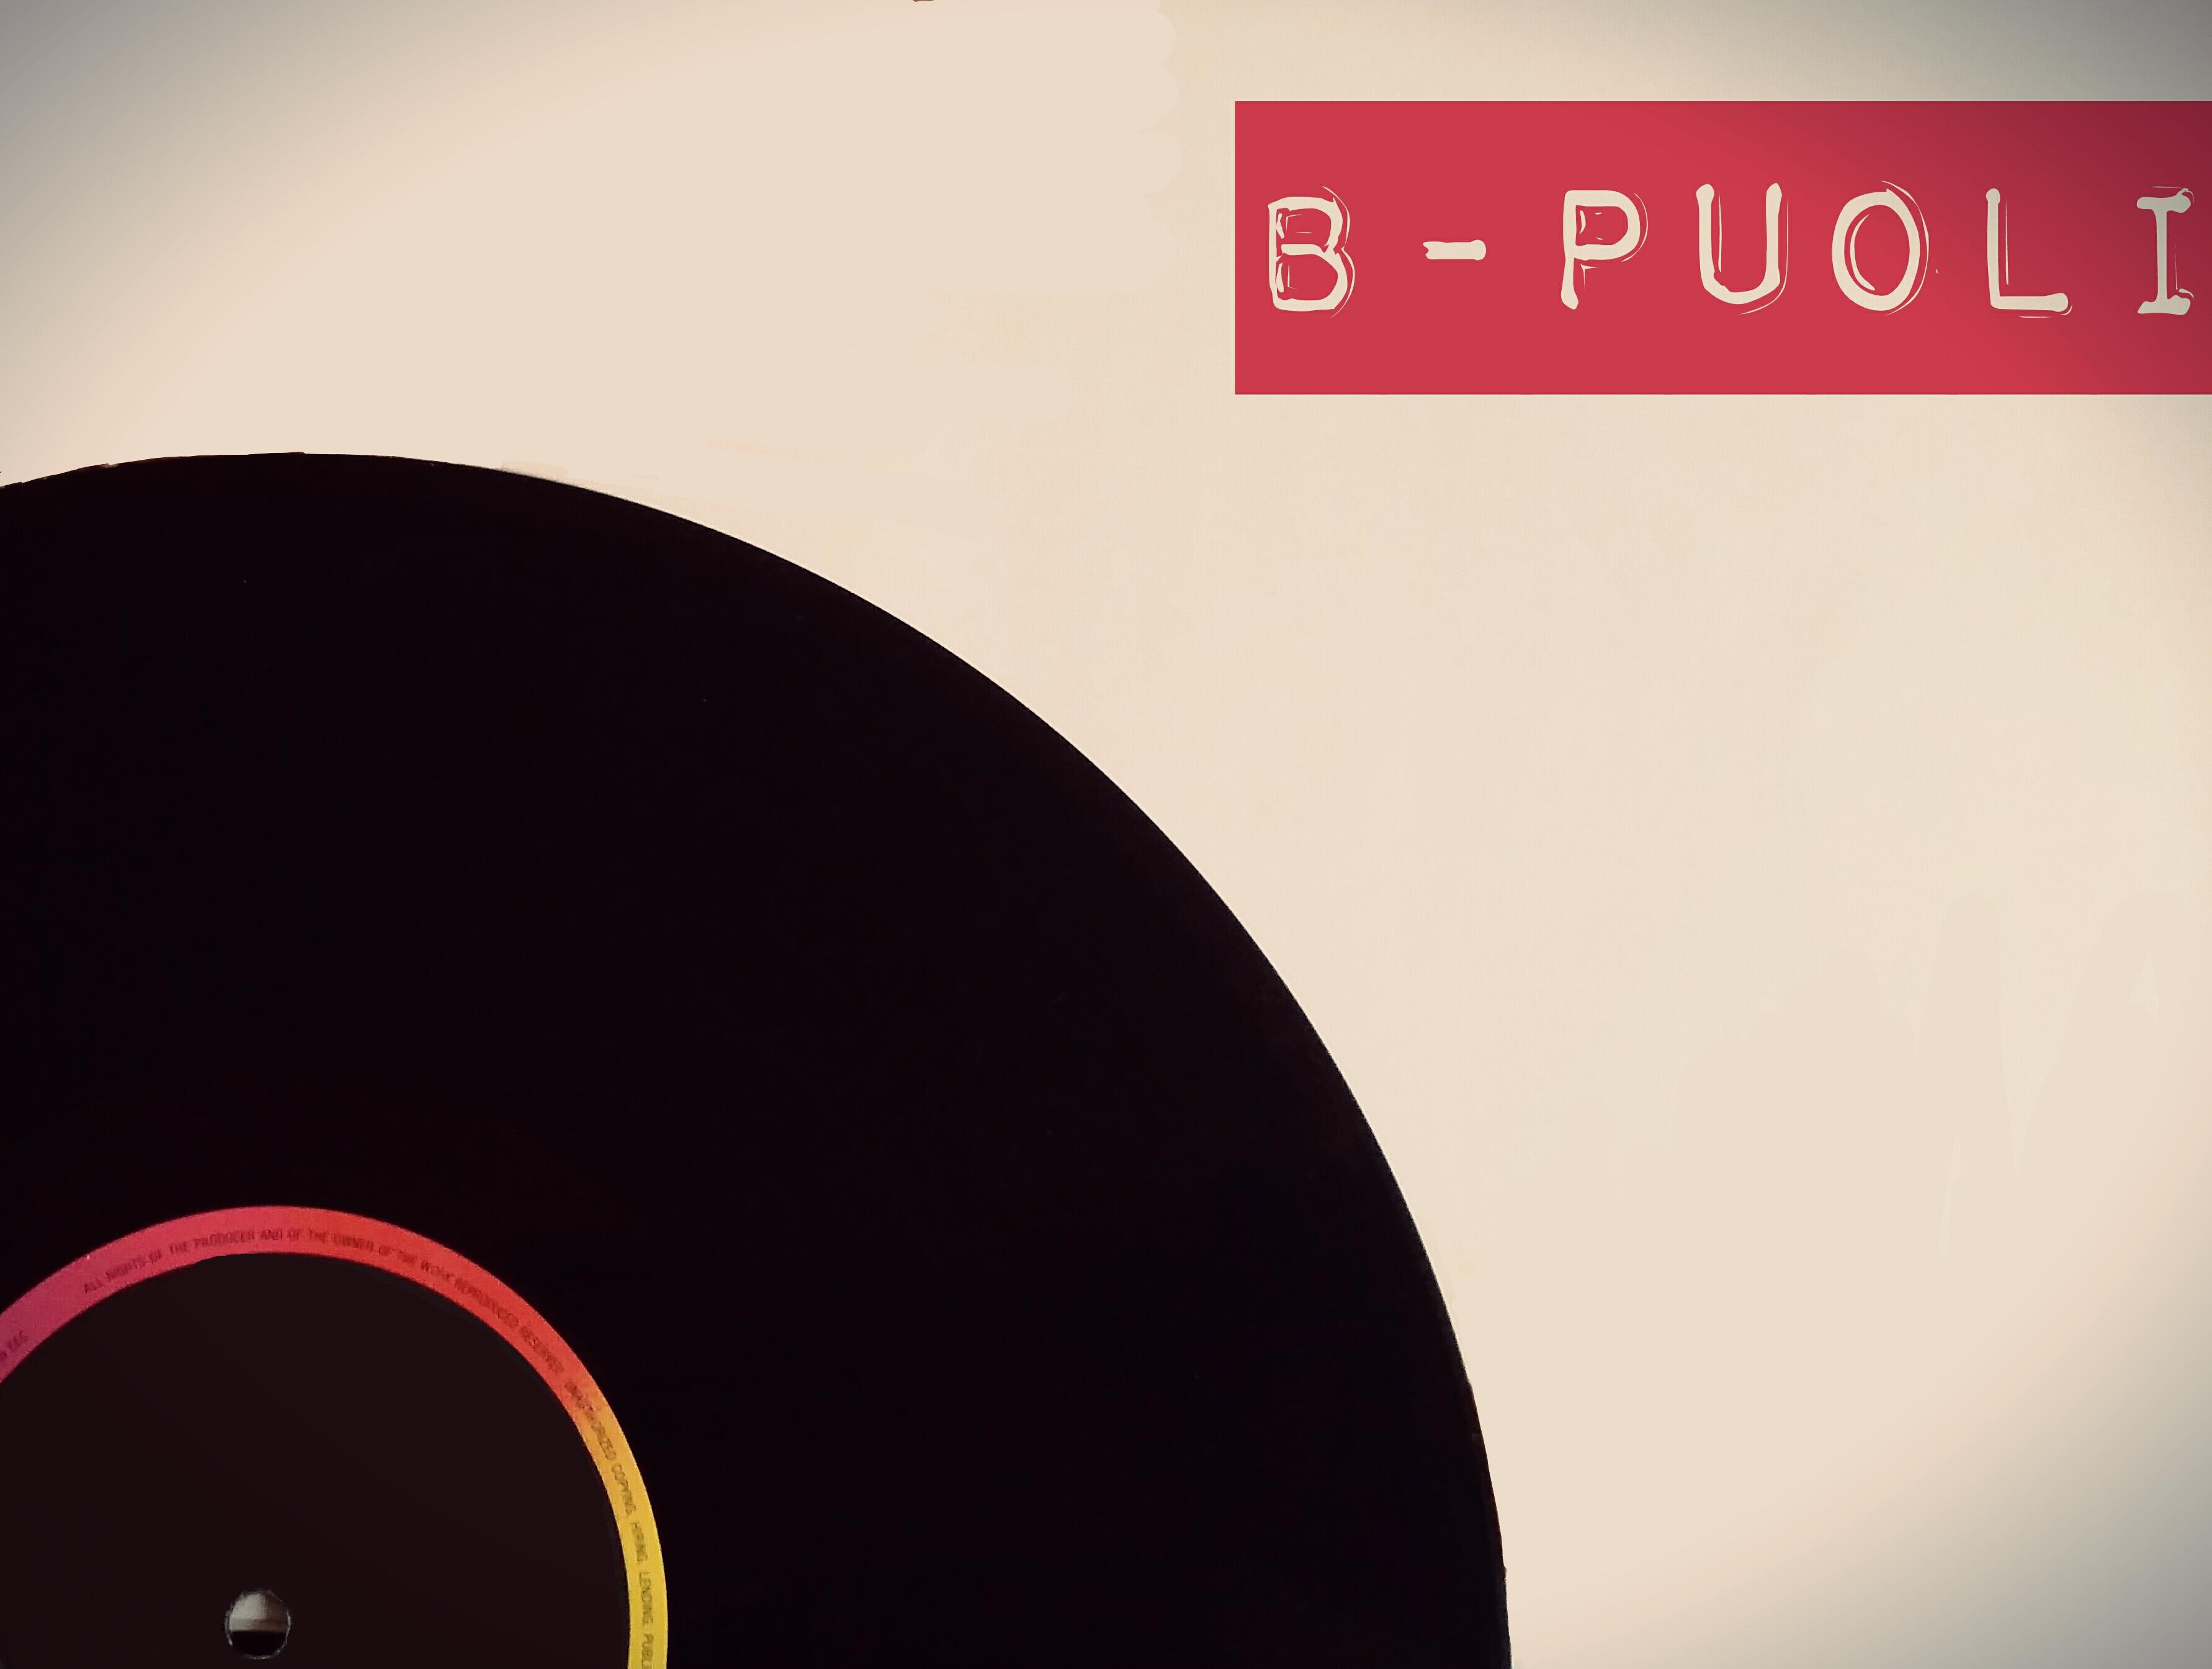 B-puoli